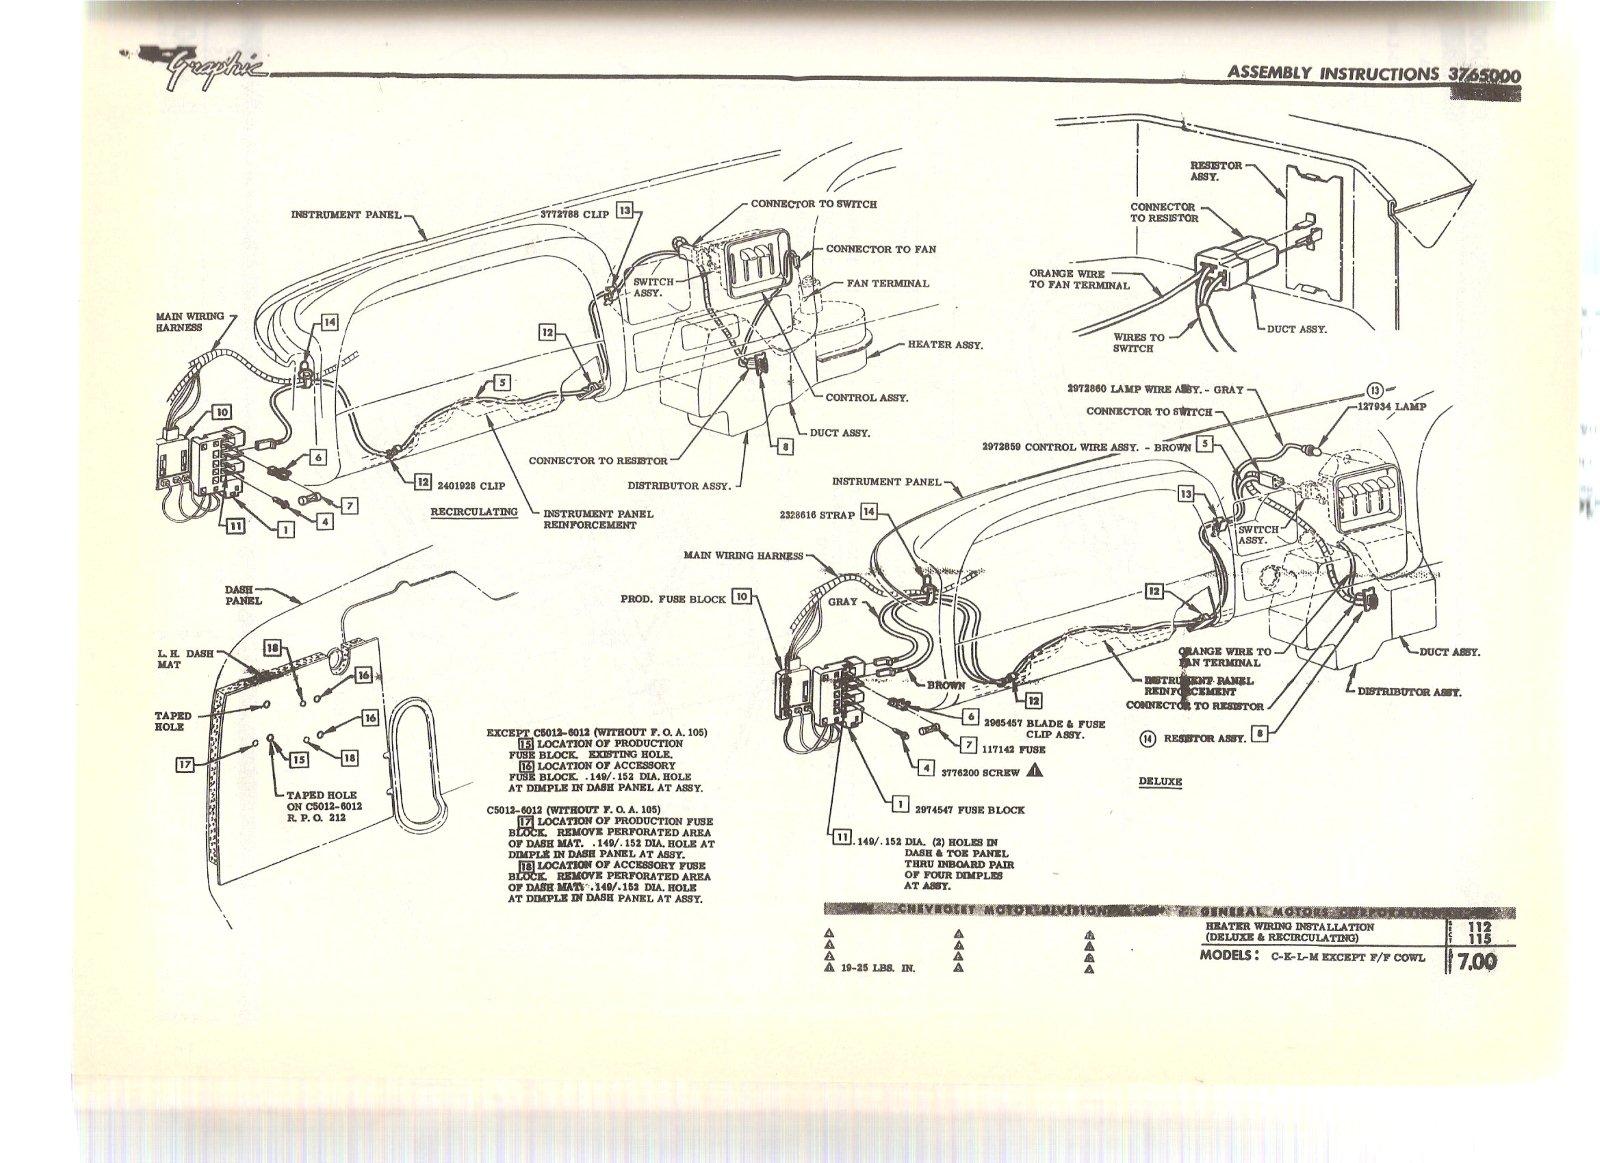 59 chevy wiper switch wiring diagram 77 corvette